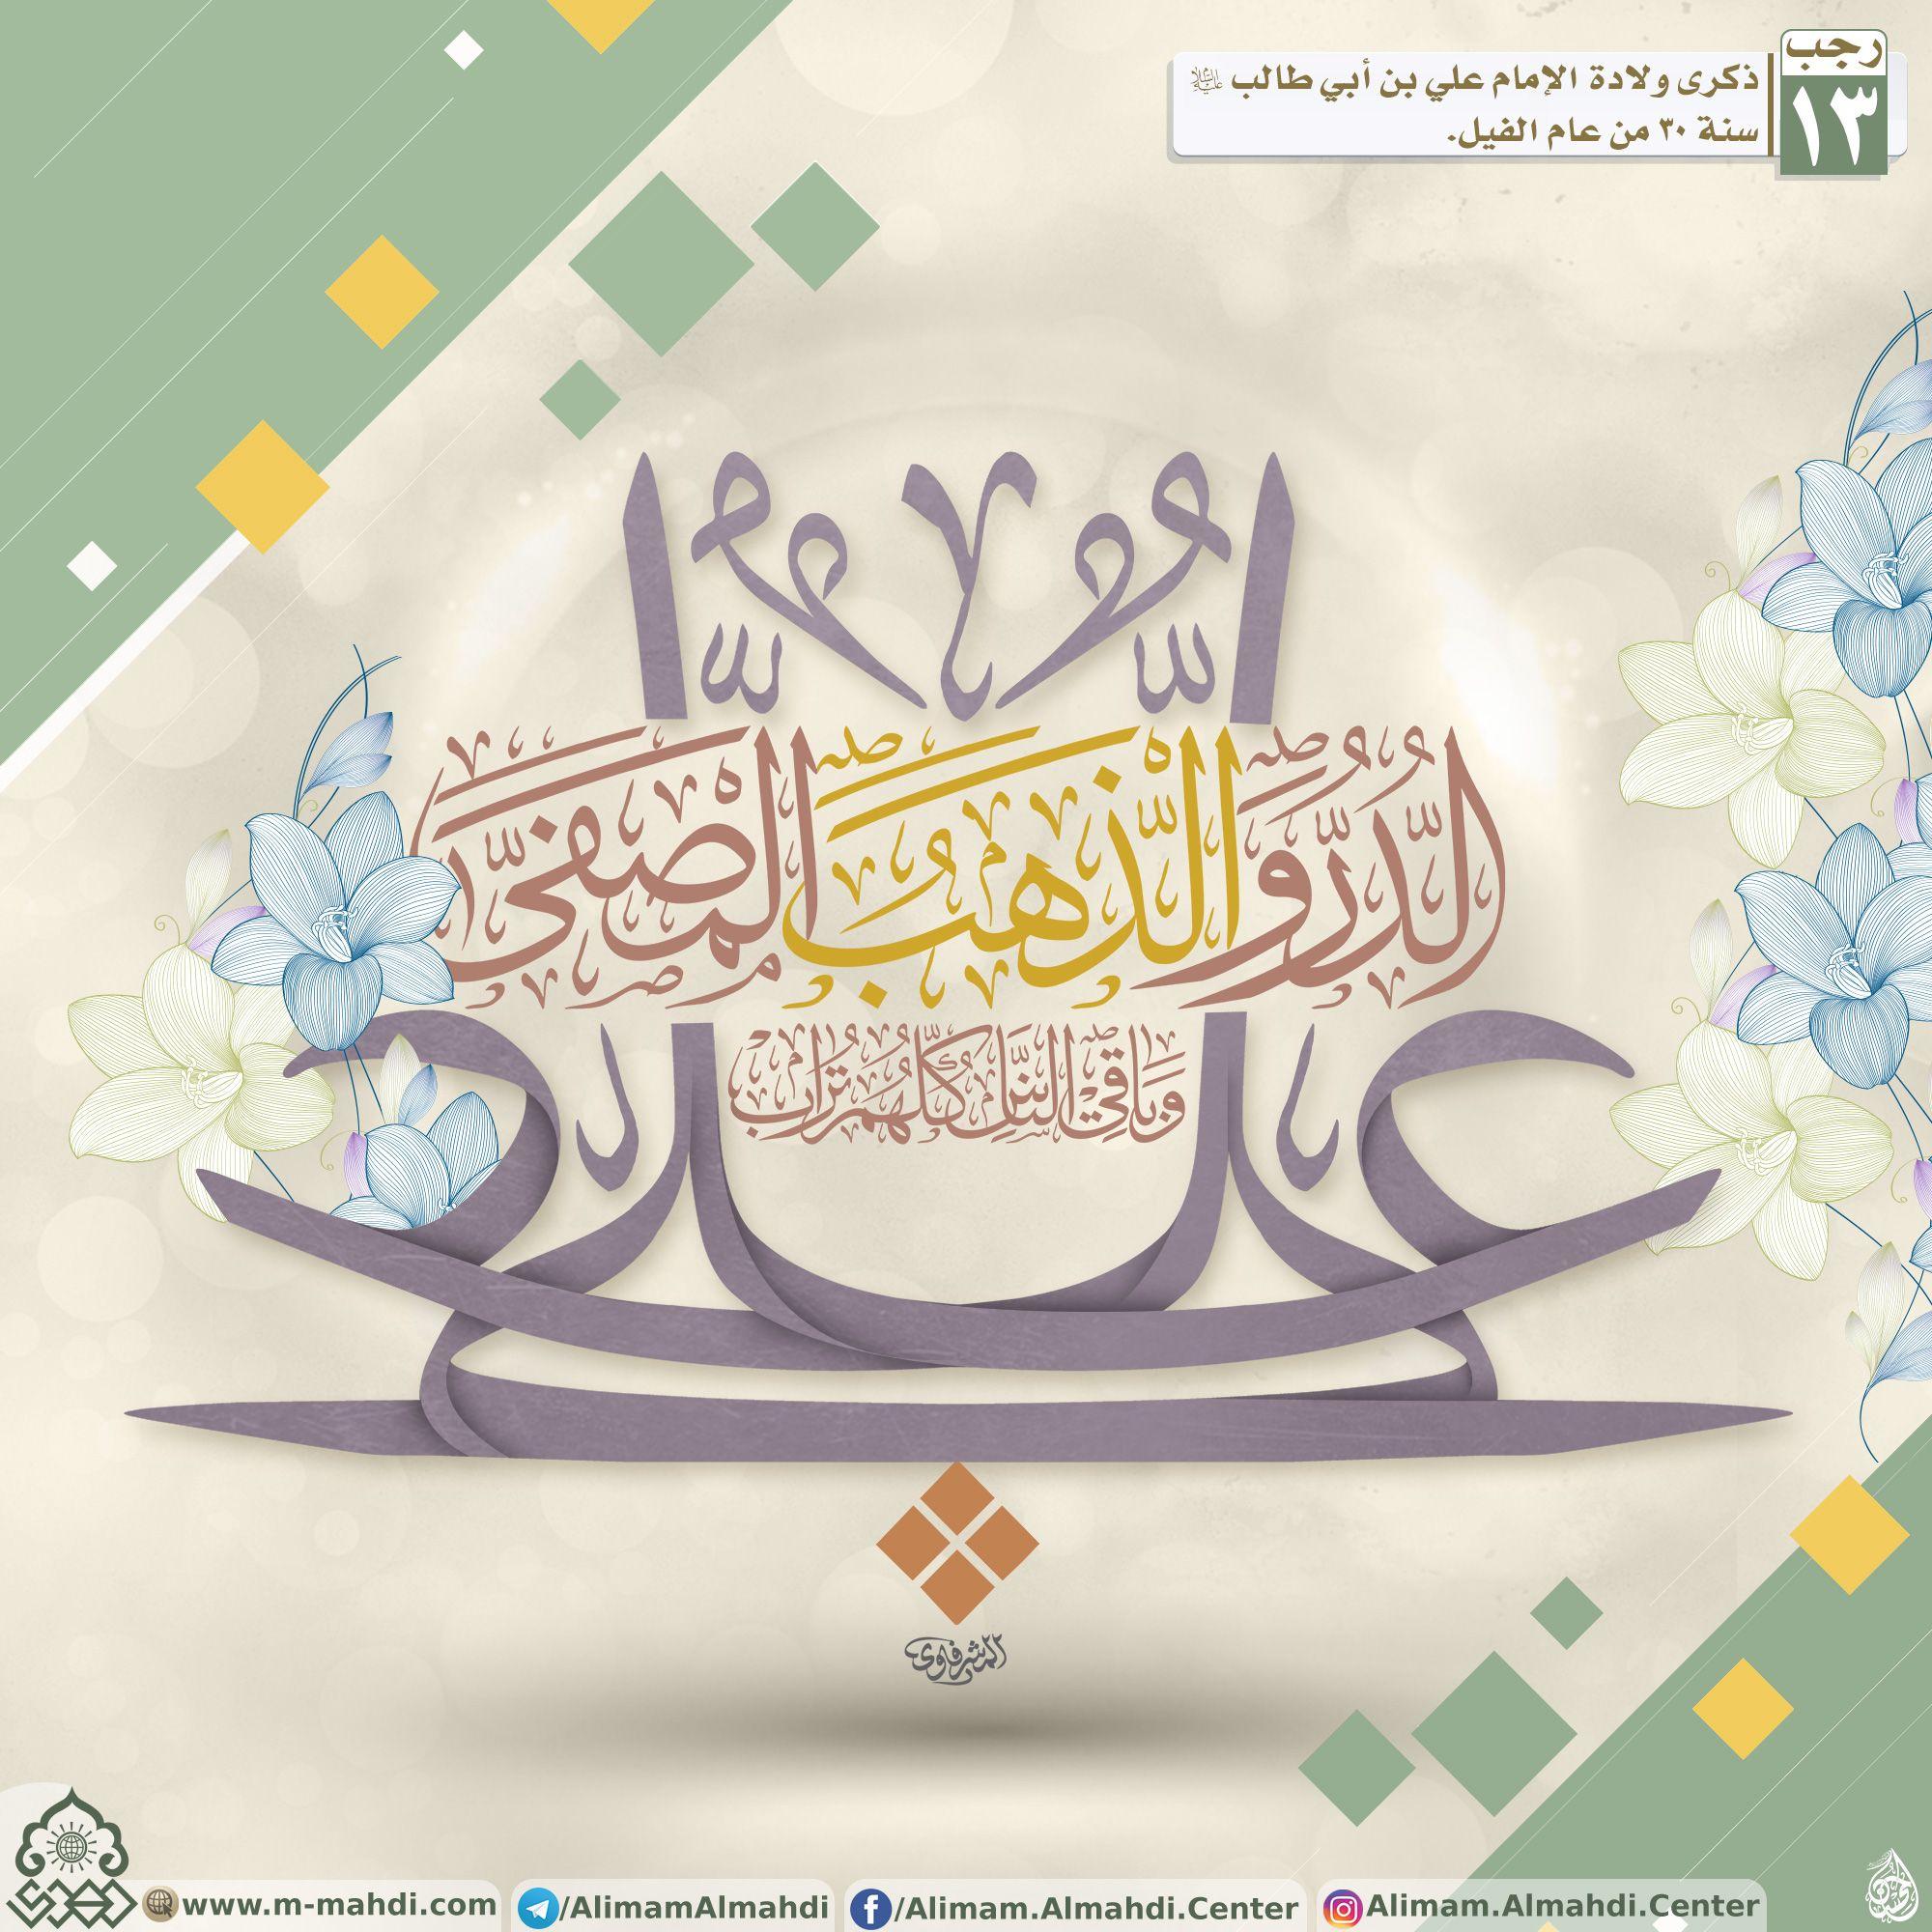 Pin By مركز الدراسات التخصصية في الإم On Allah In 2020 Imam Hussain Imam Ali Islam